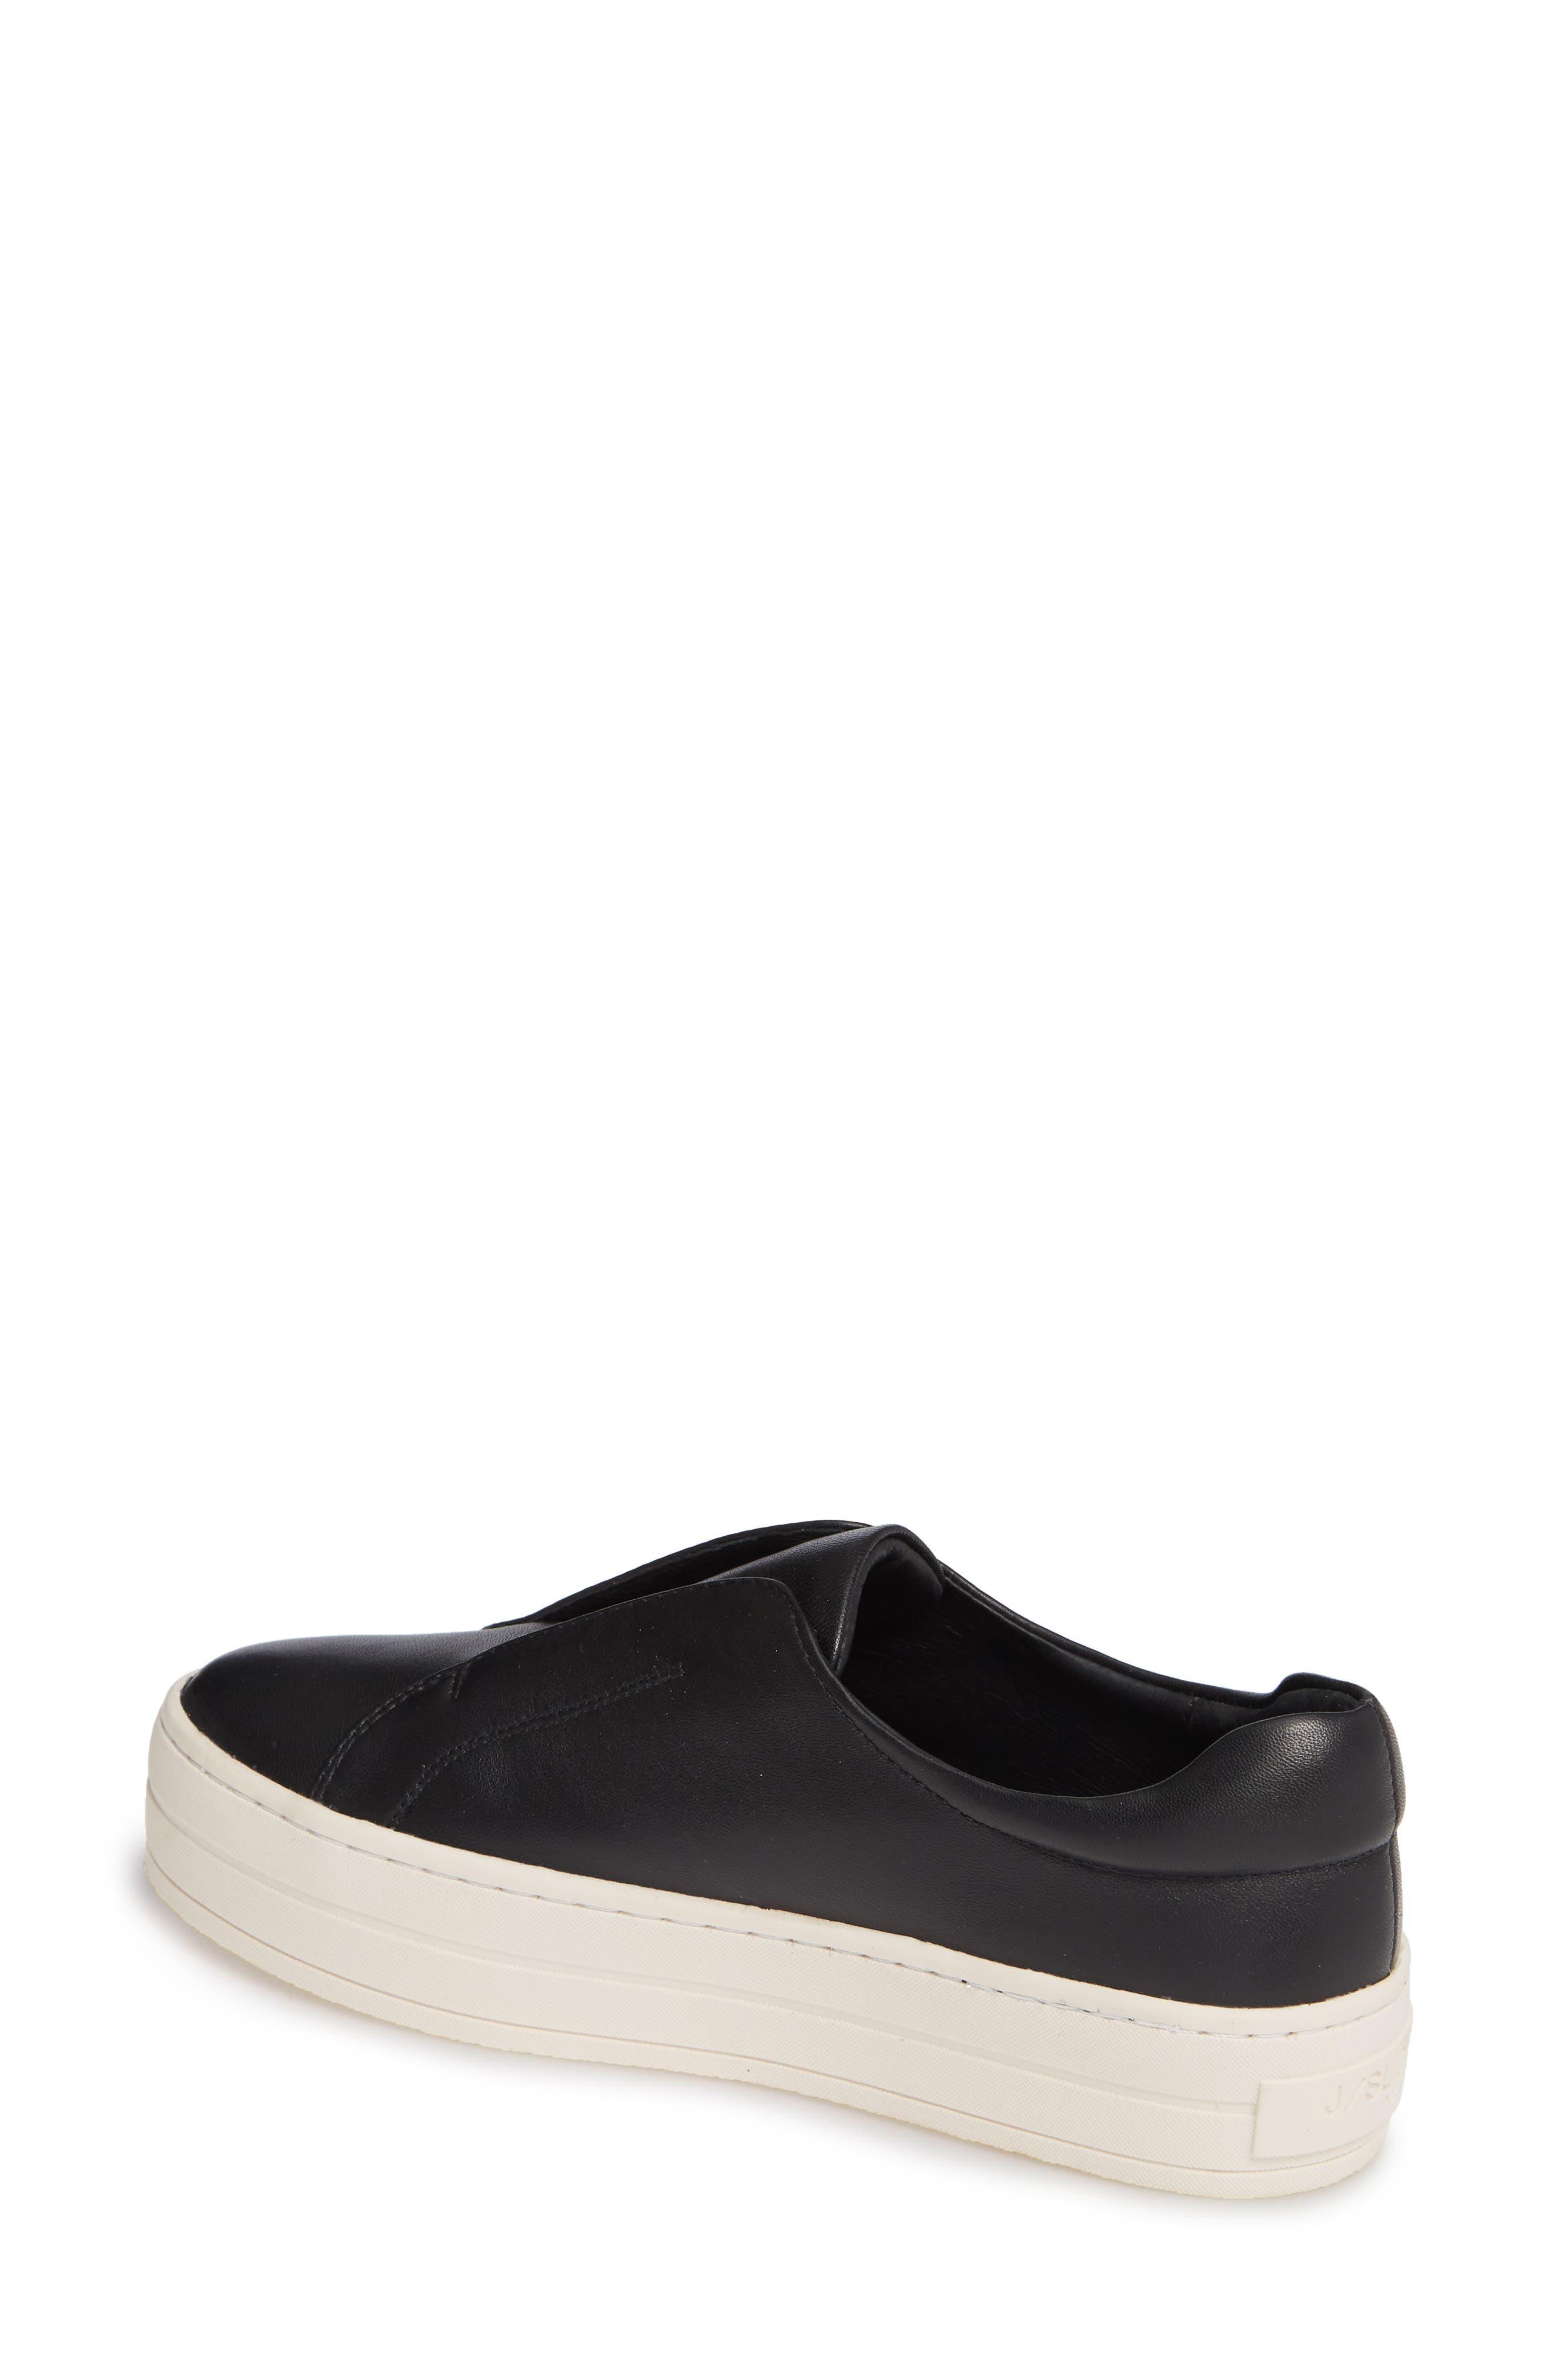 JSLIDES,                             Heidi Platform Slip-On Sneaker,                             Alternate thumbnail 2, color,                             BLACK LEATHER